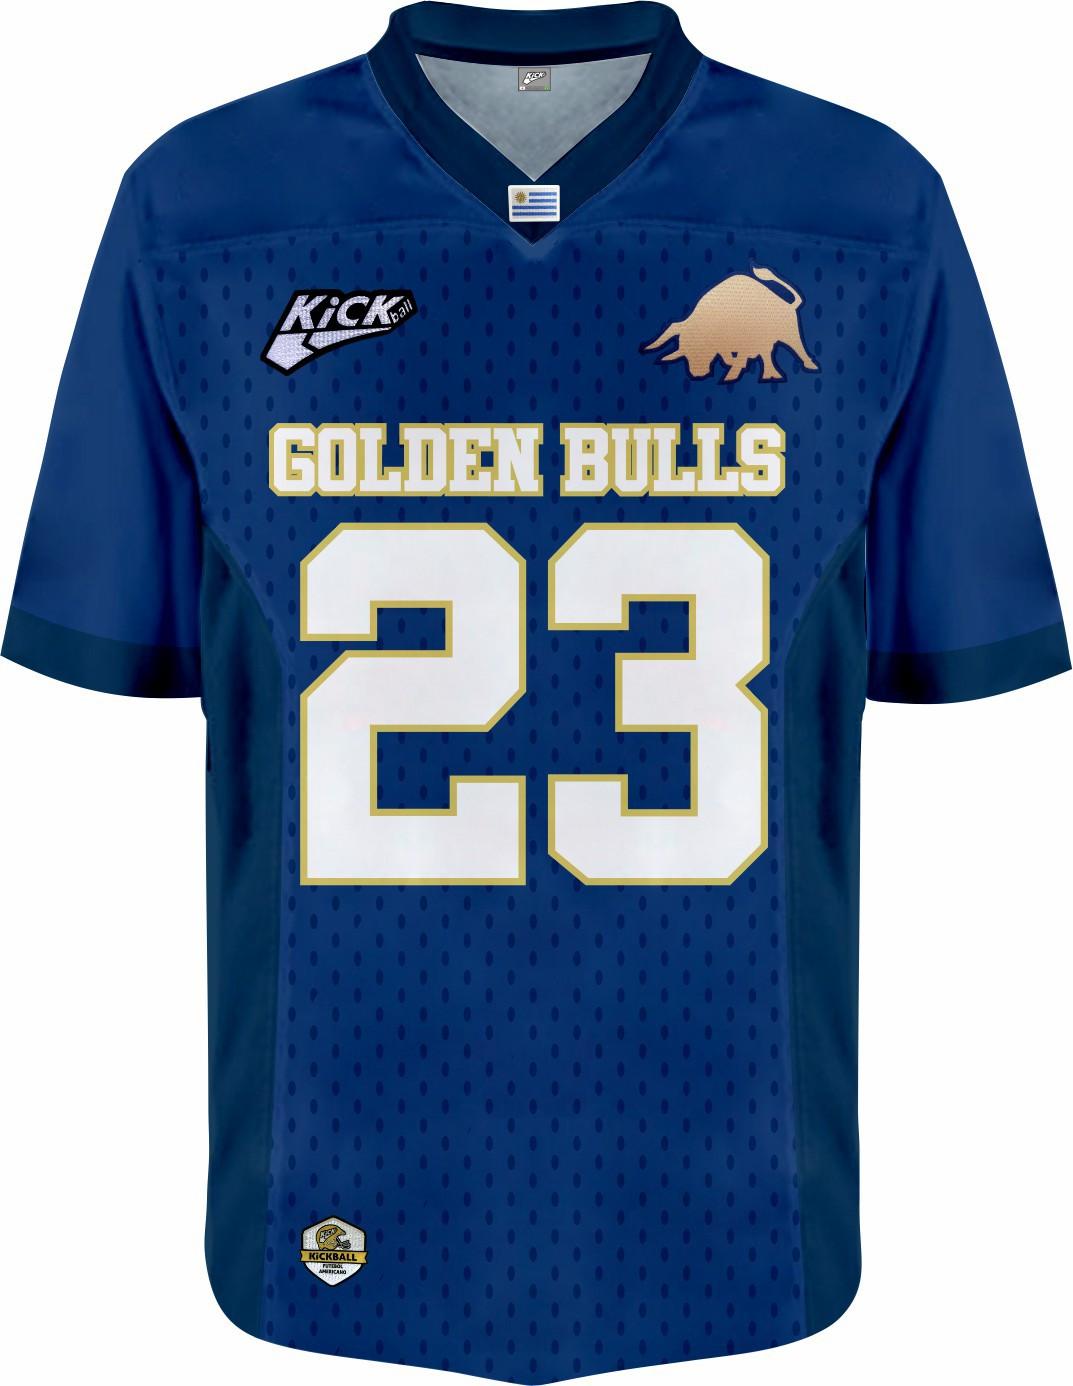 Camisa Of.  Golden Bulls Jersey Plus Inf. Mod1